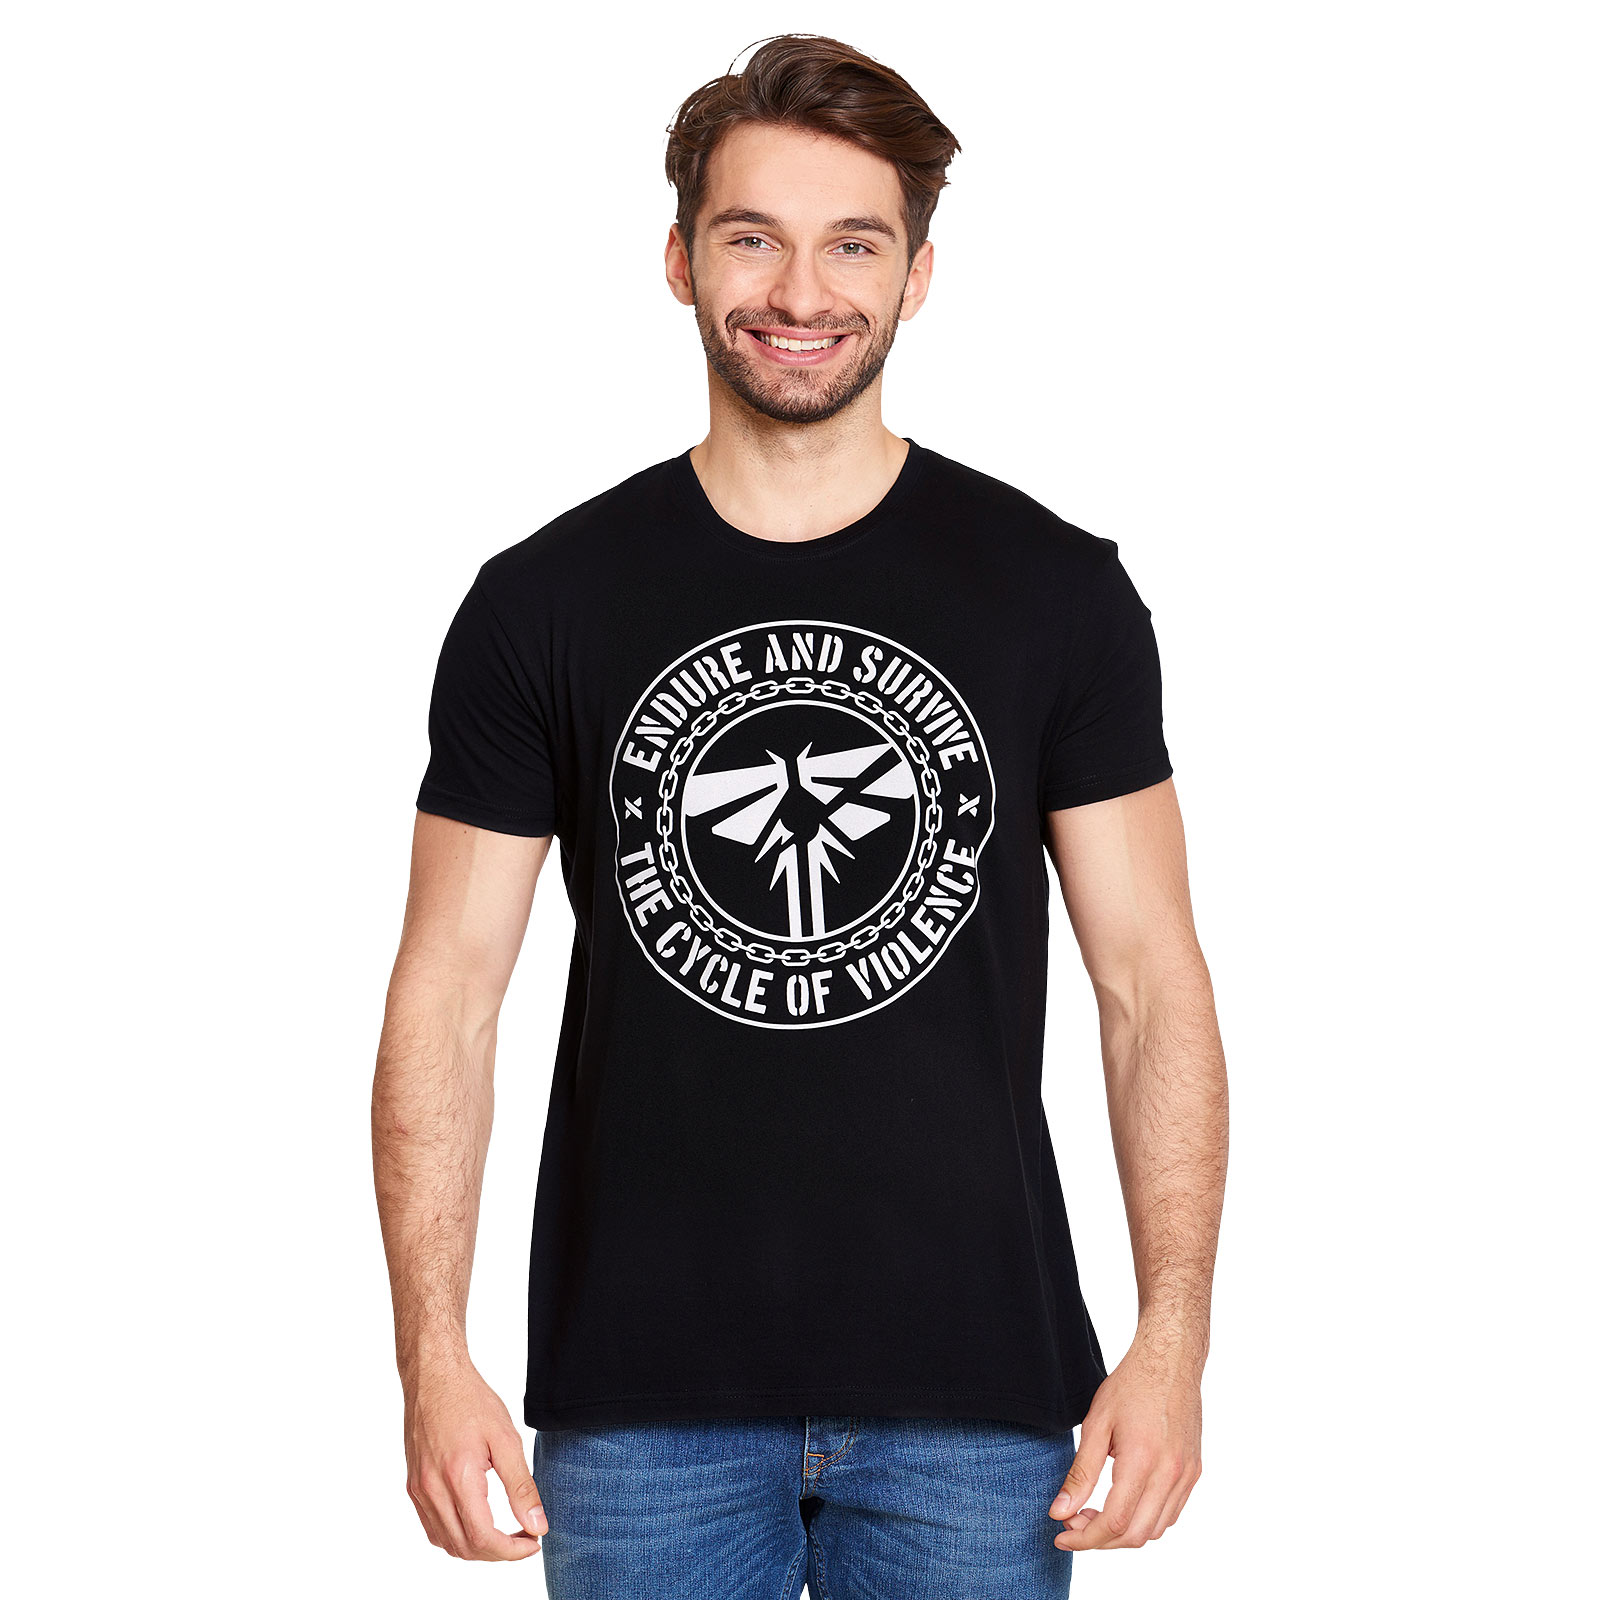 Endure and Survive T-Shirt für The Last of Us Fans schwarz